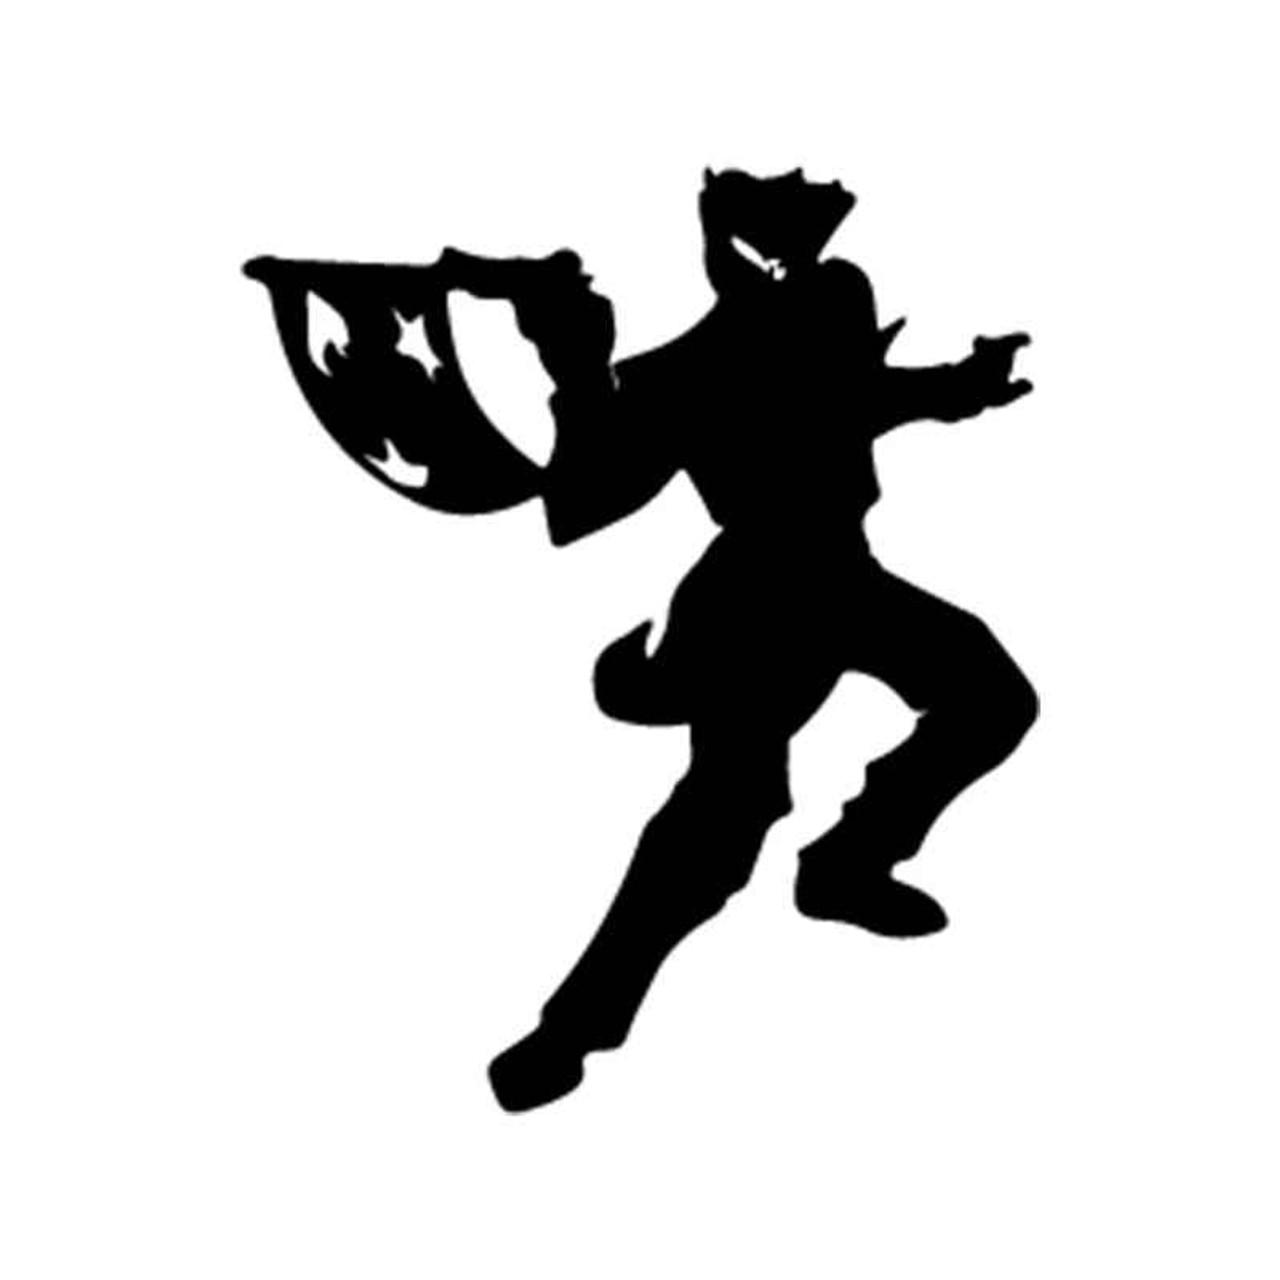 Batman the joker silhouette vinyl sticker